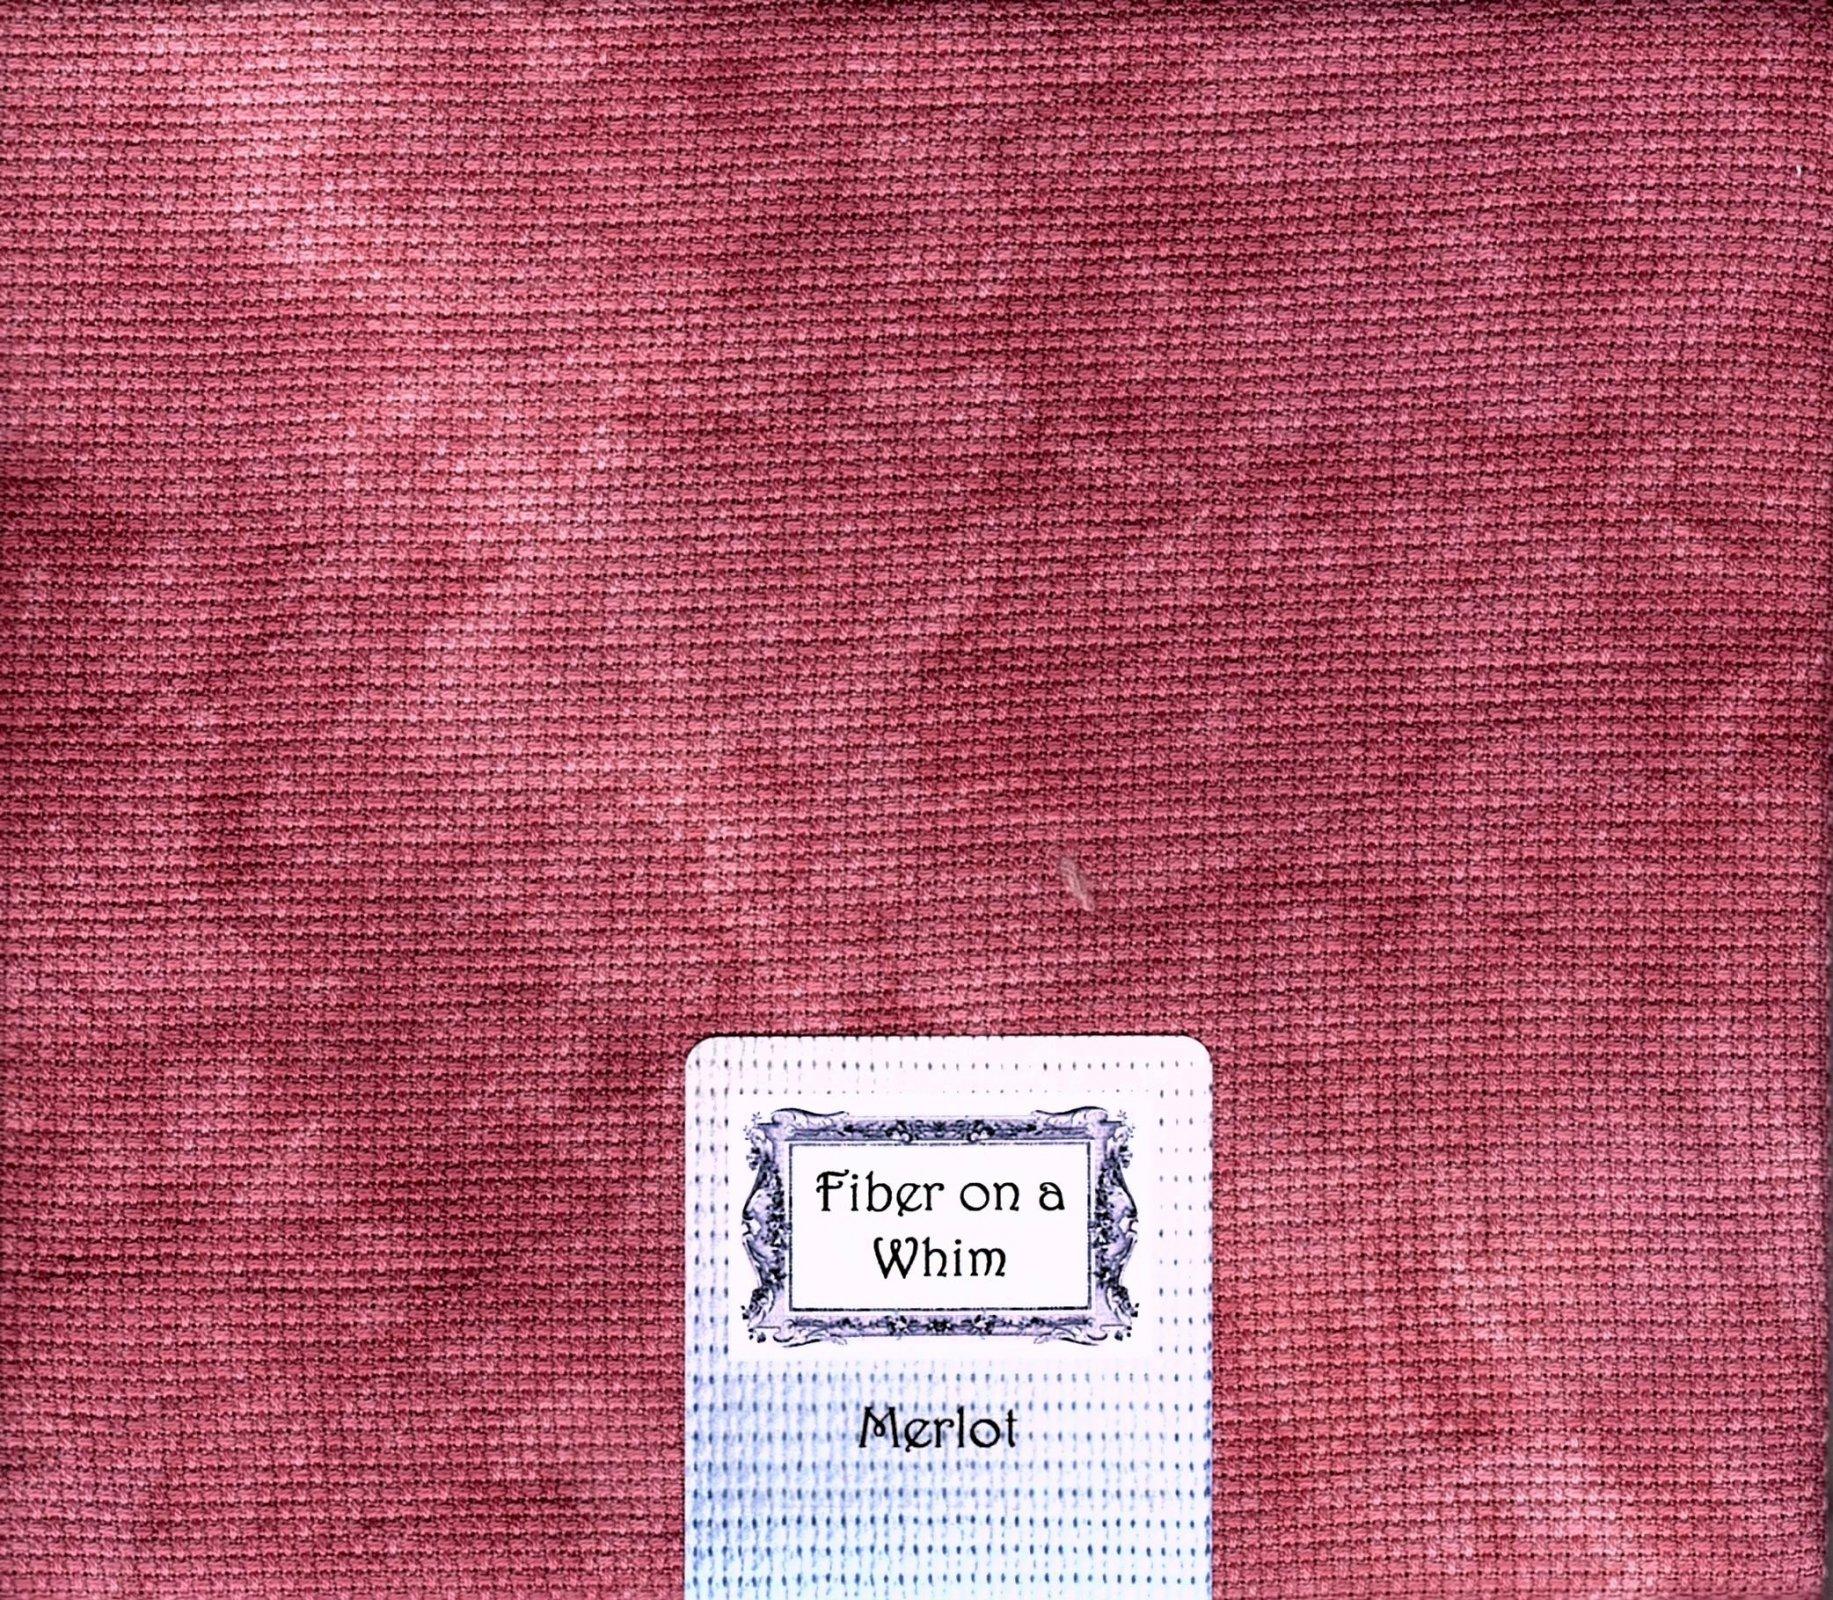 Merlot Hand-dyed 14ct Aida Cotton Fat Quarter 18 x 28